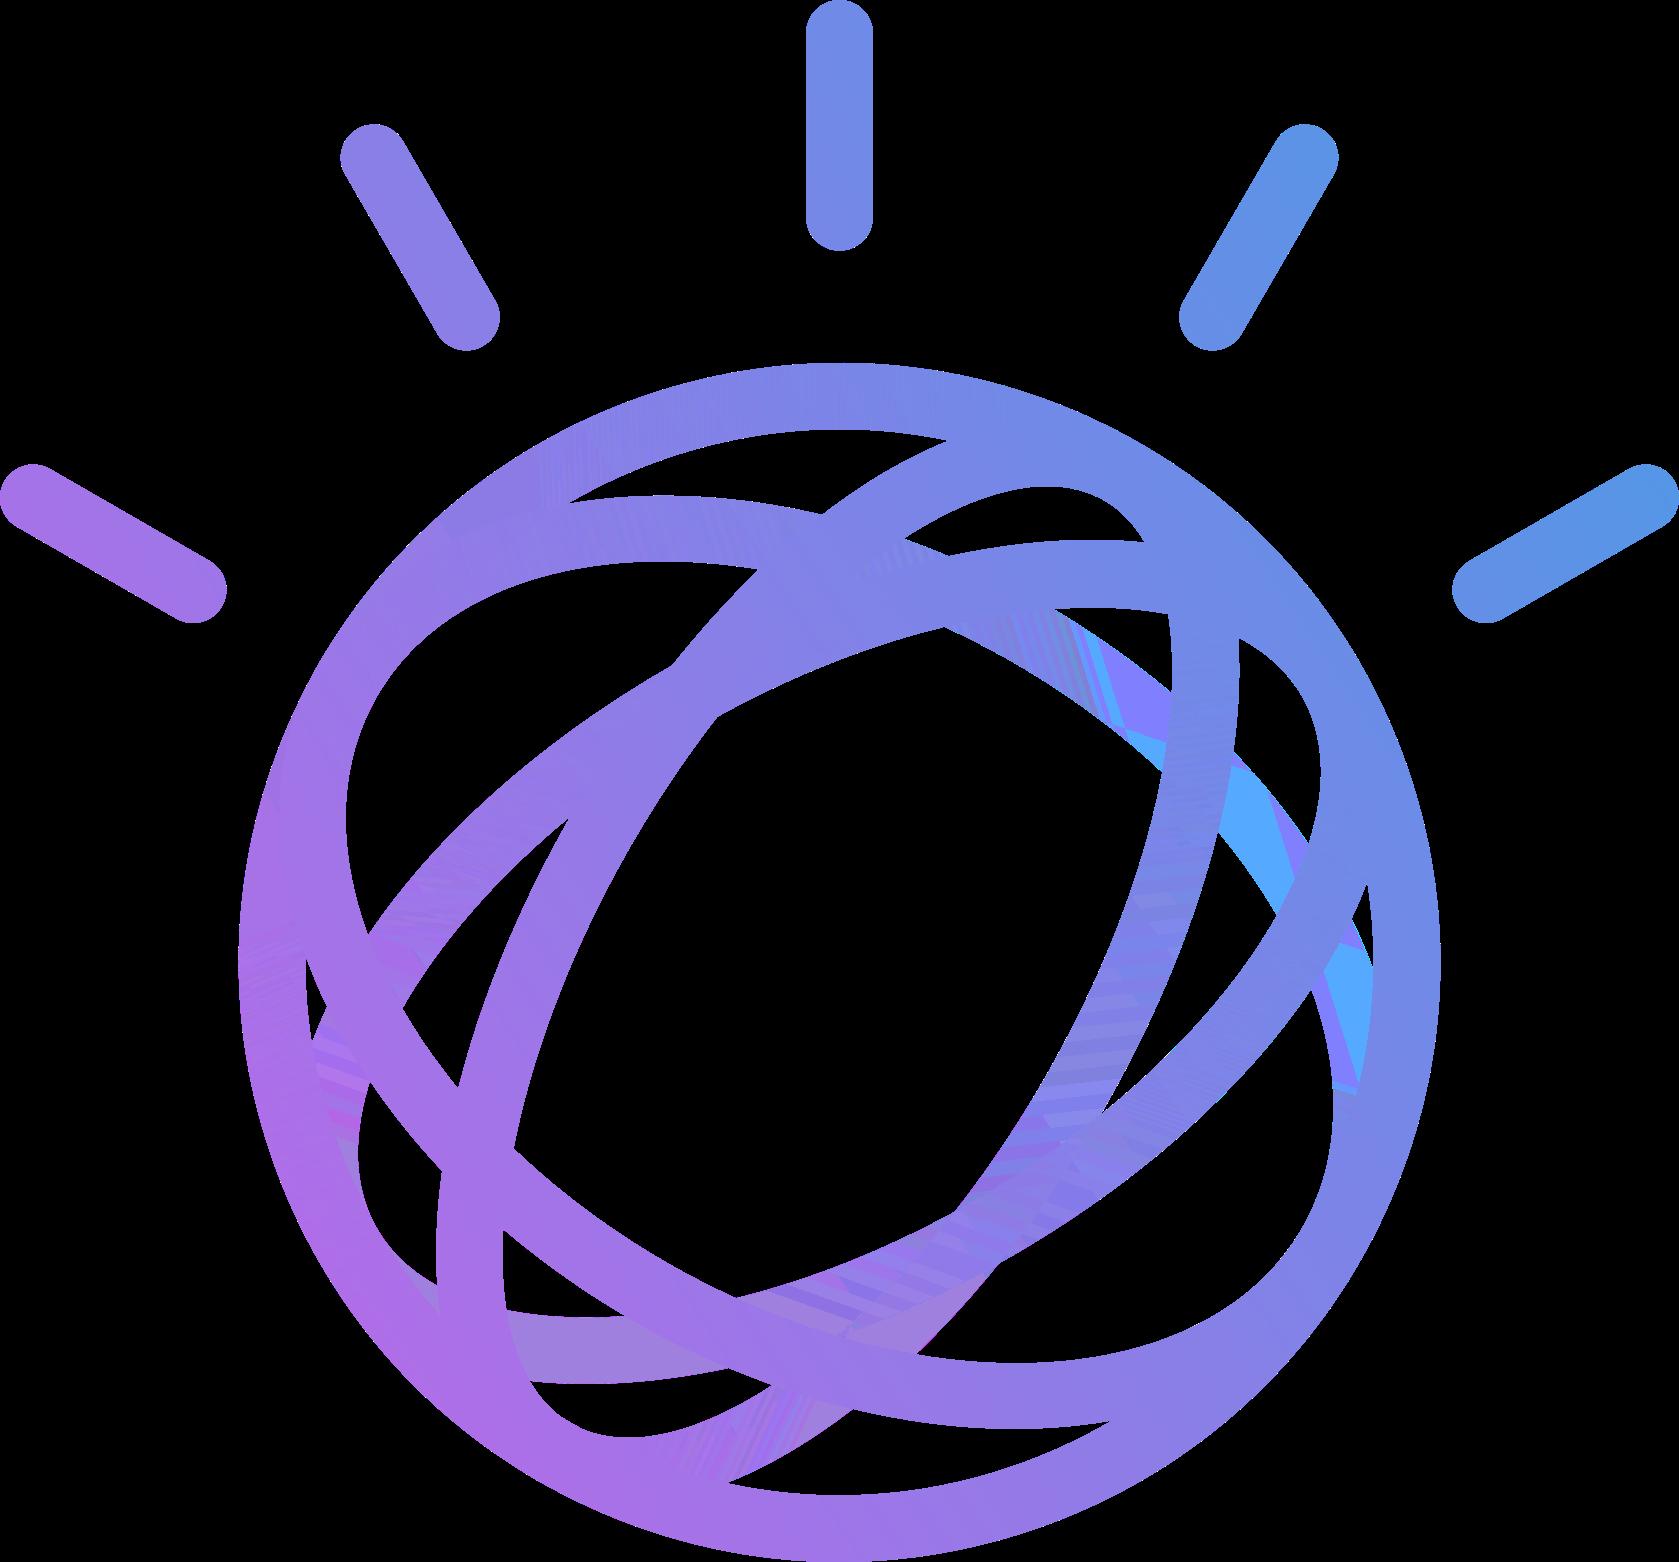 Watson Logo [IBM] Download Vector